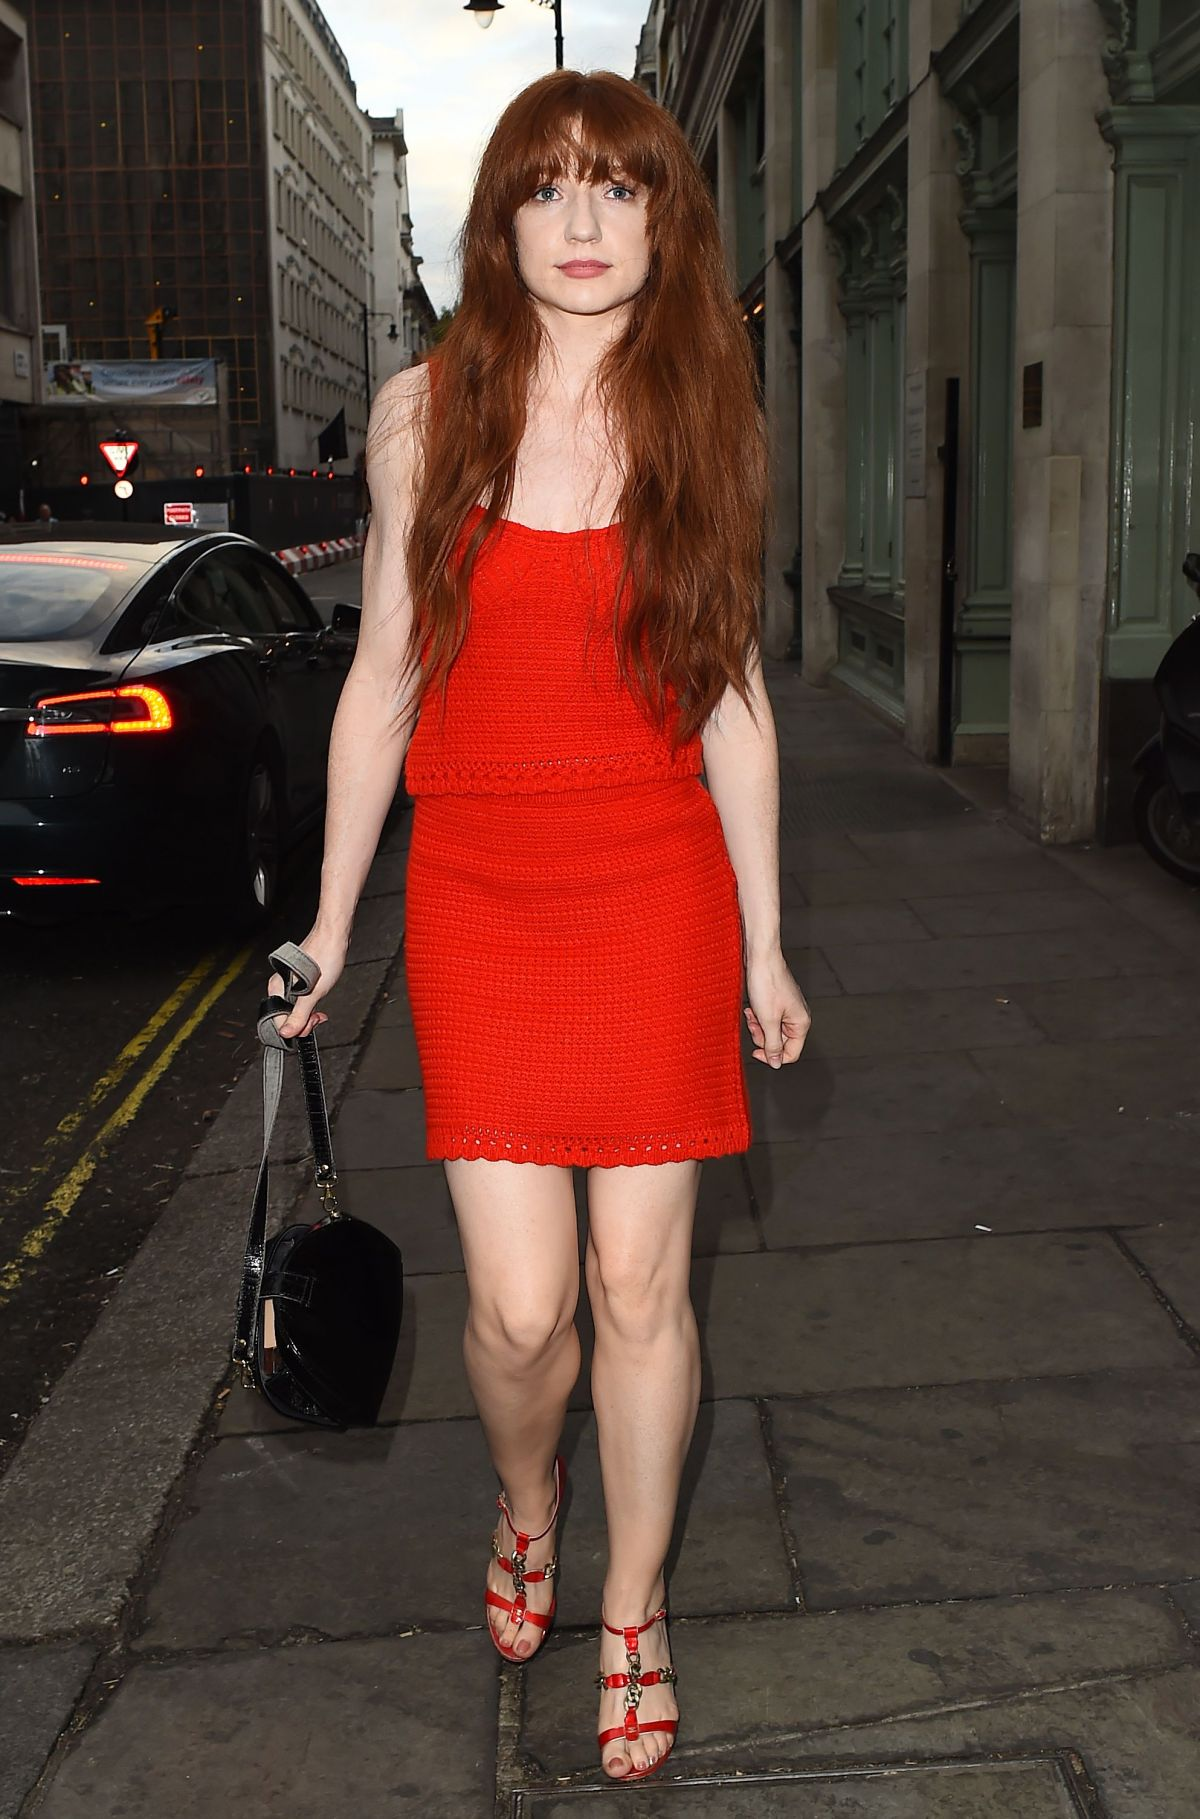 NICOLA ROBERTS at Tramp Nightclub in London 07/04/2017